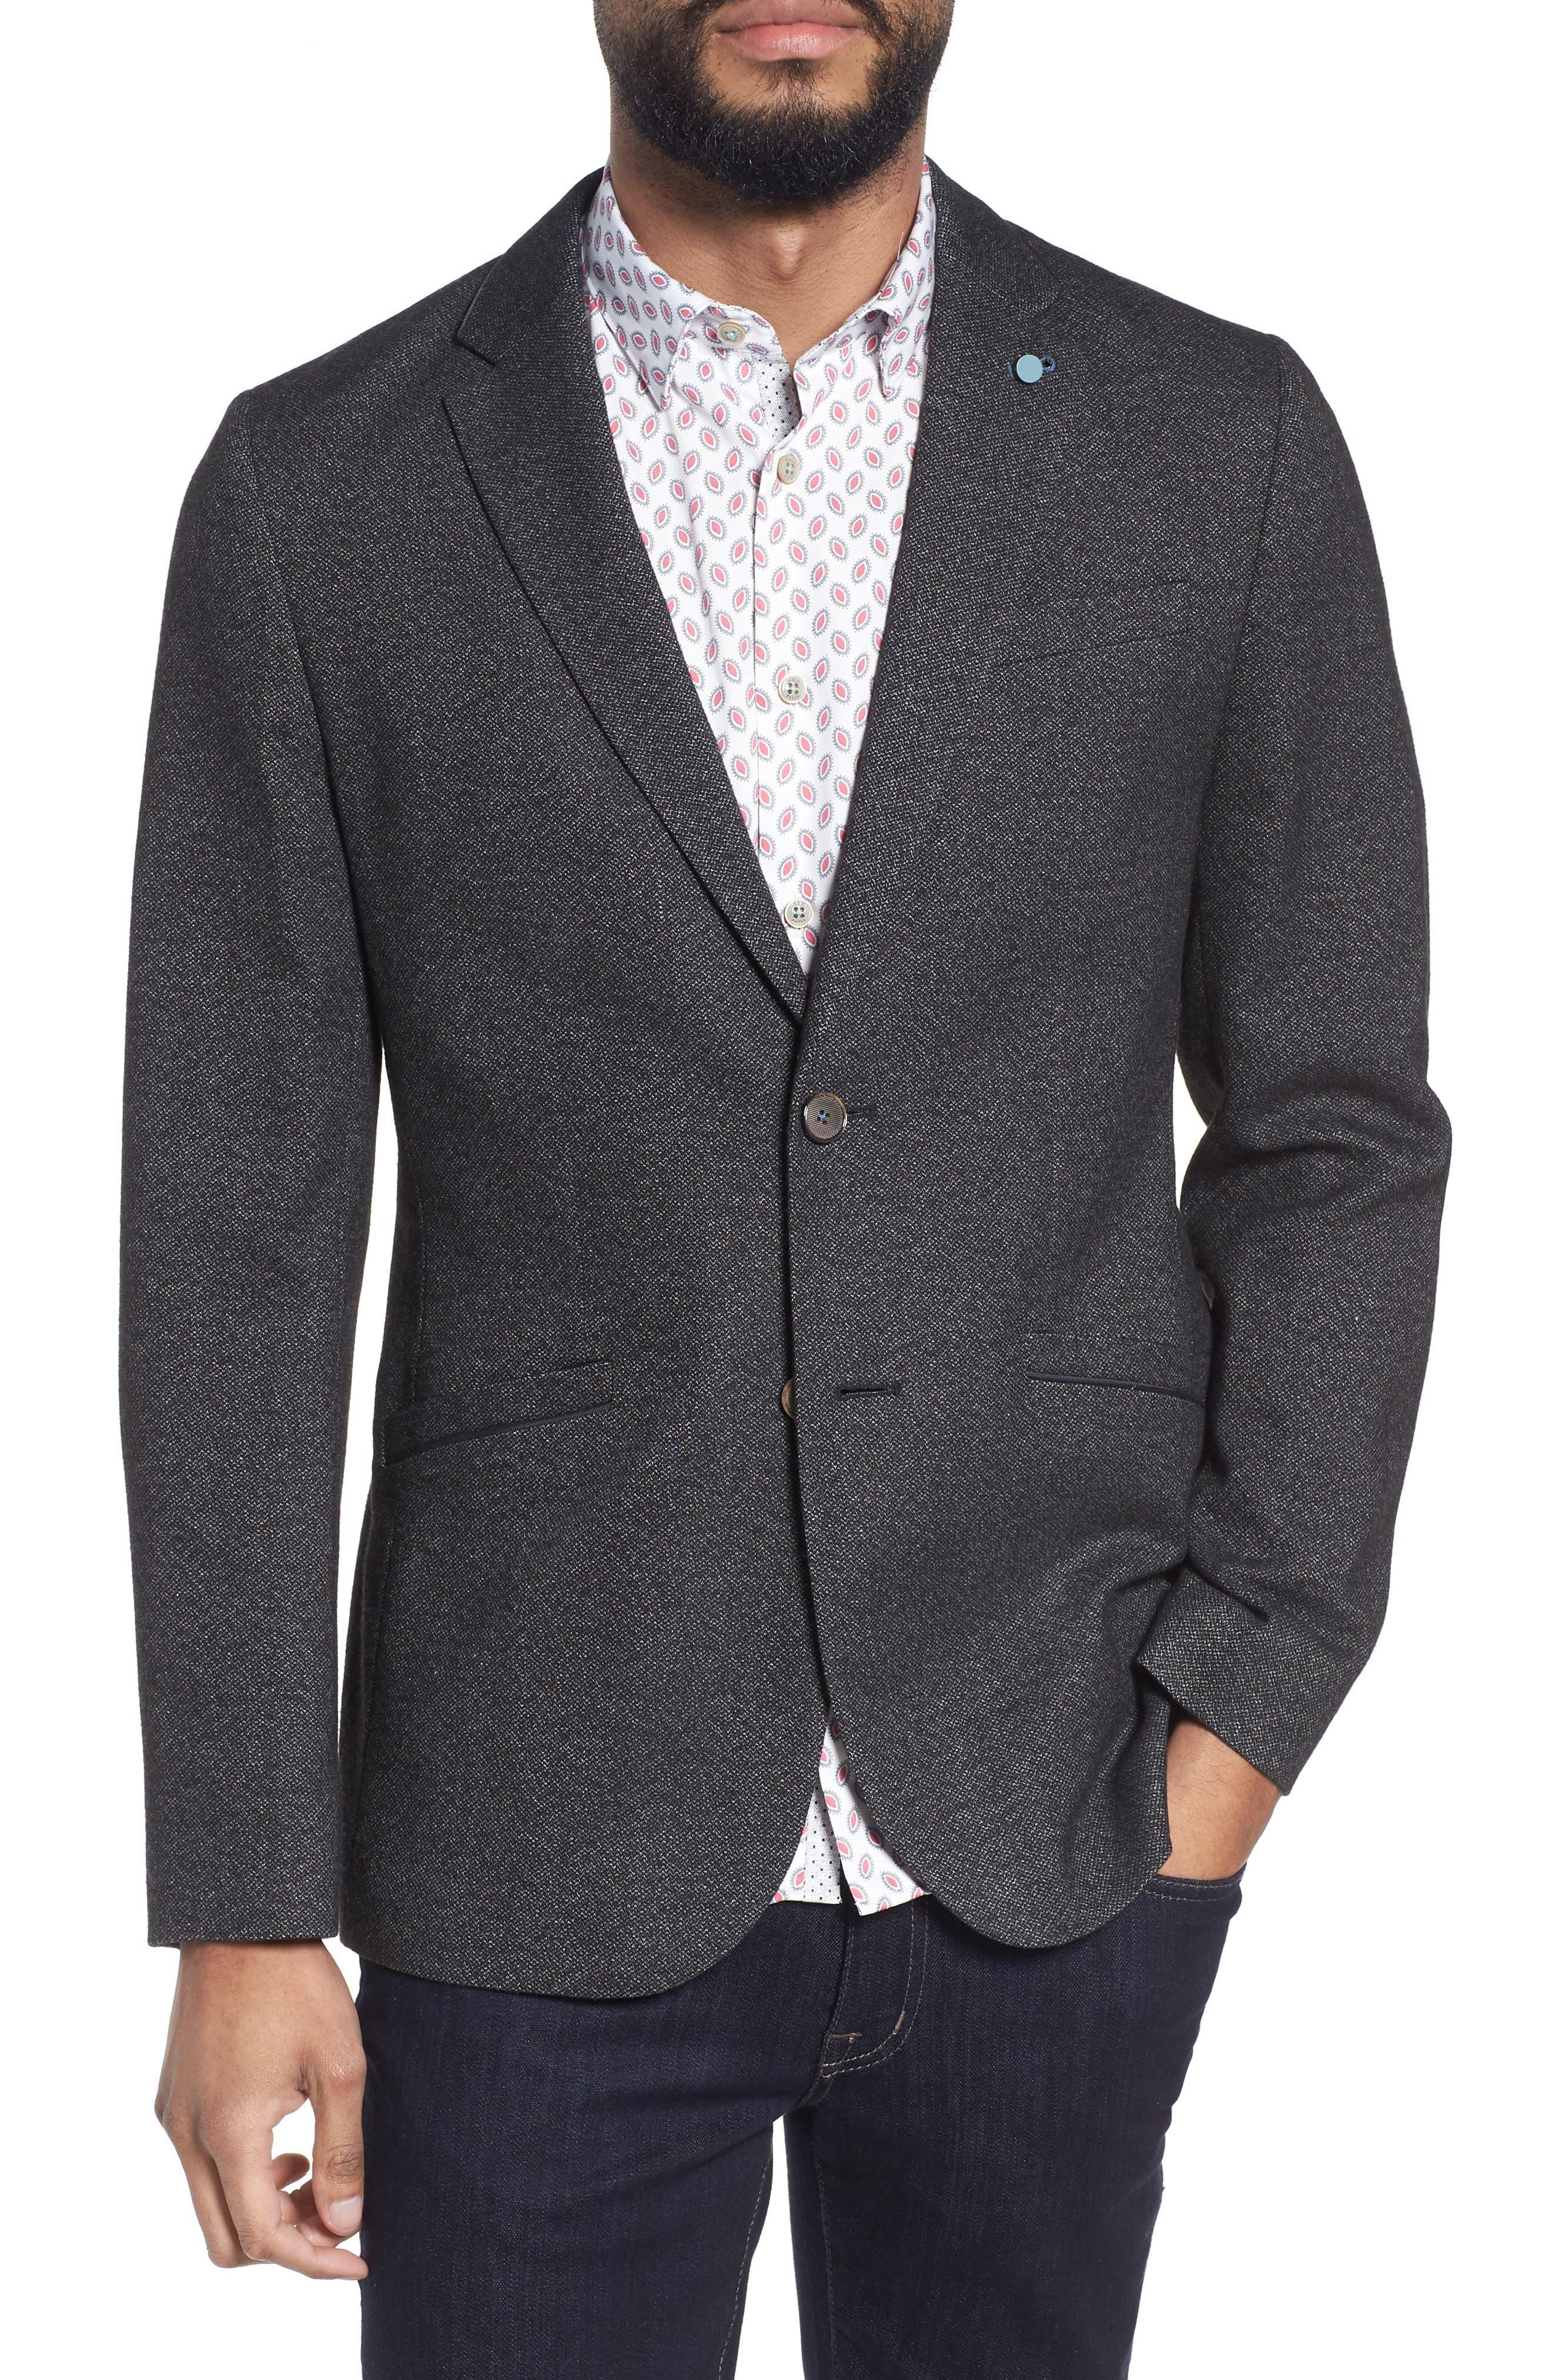 Beektt Semi Plain Trim Fit Jacket,                             Main thumbnail 1, color,                             Charcoal